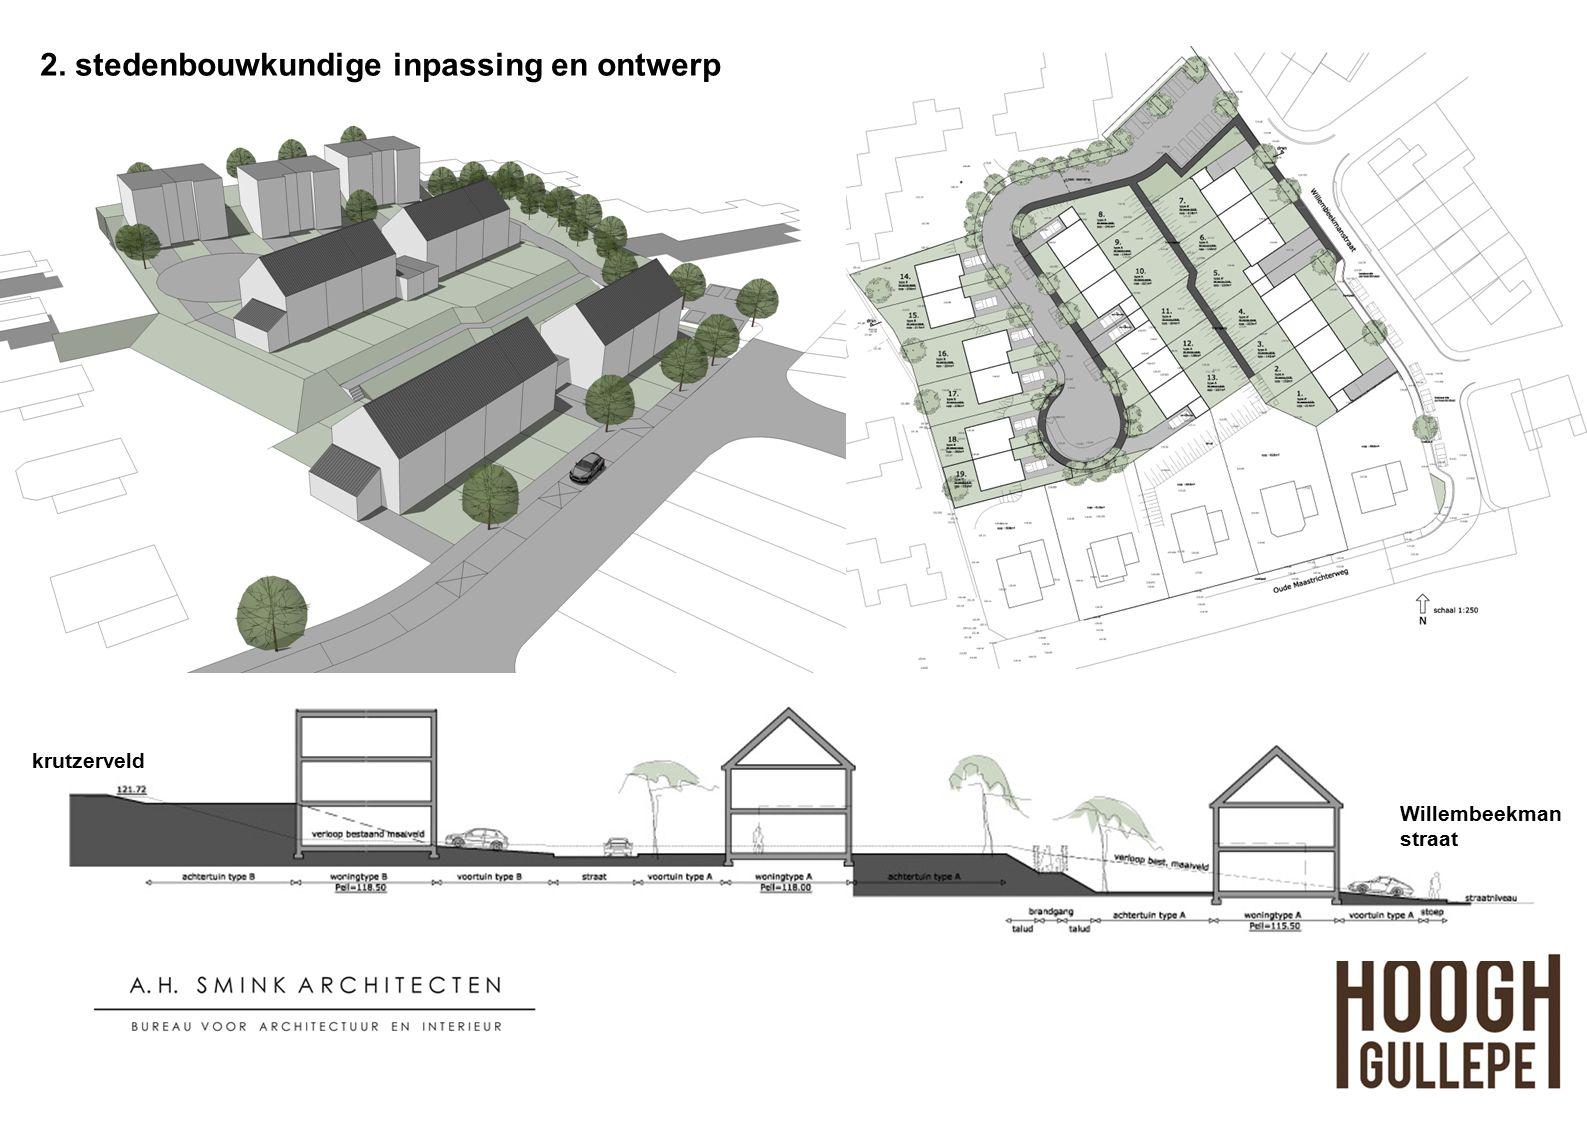 2. stedenbouwkundige inpassing en ontwerp krutzerveld Willembeekman straat